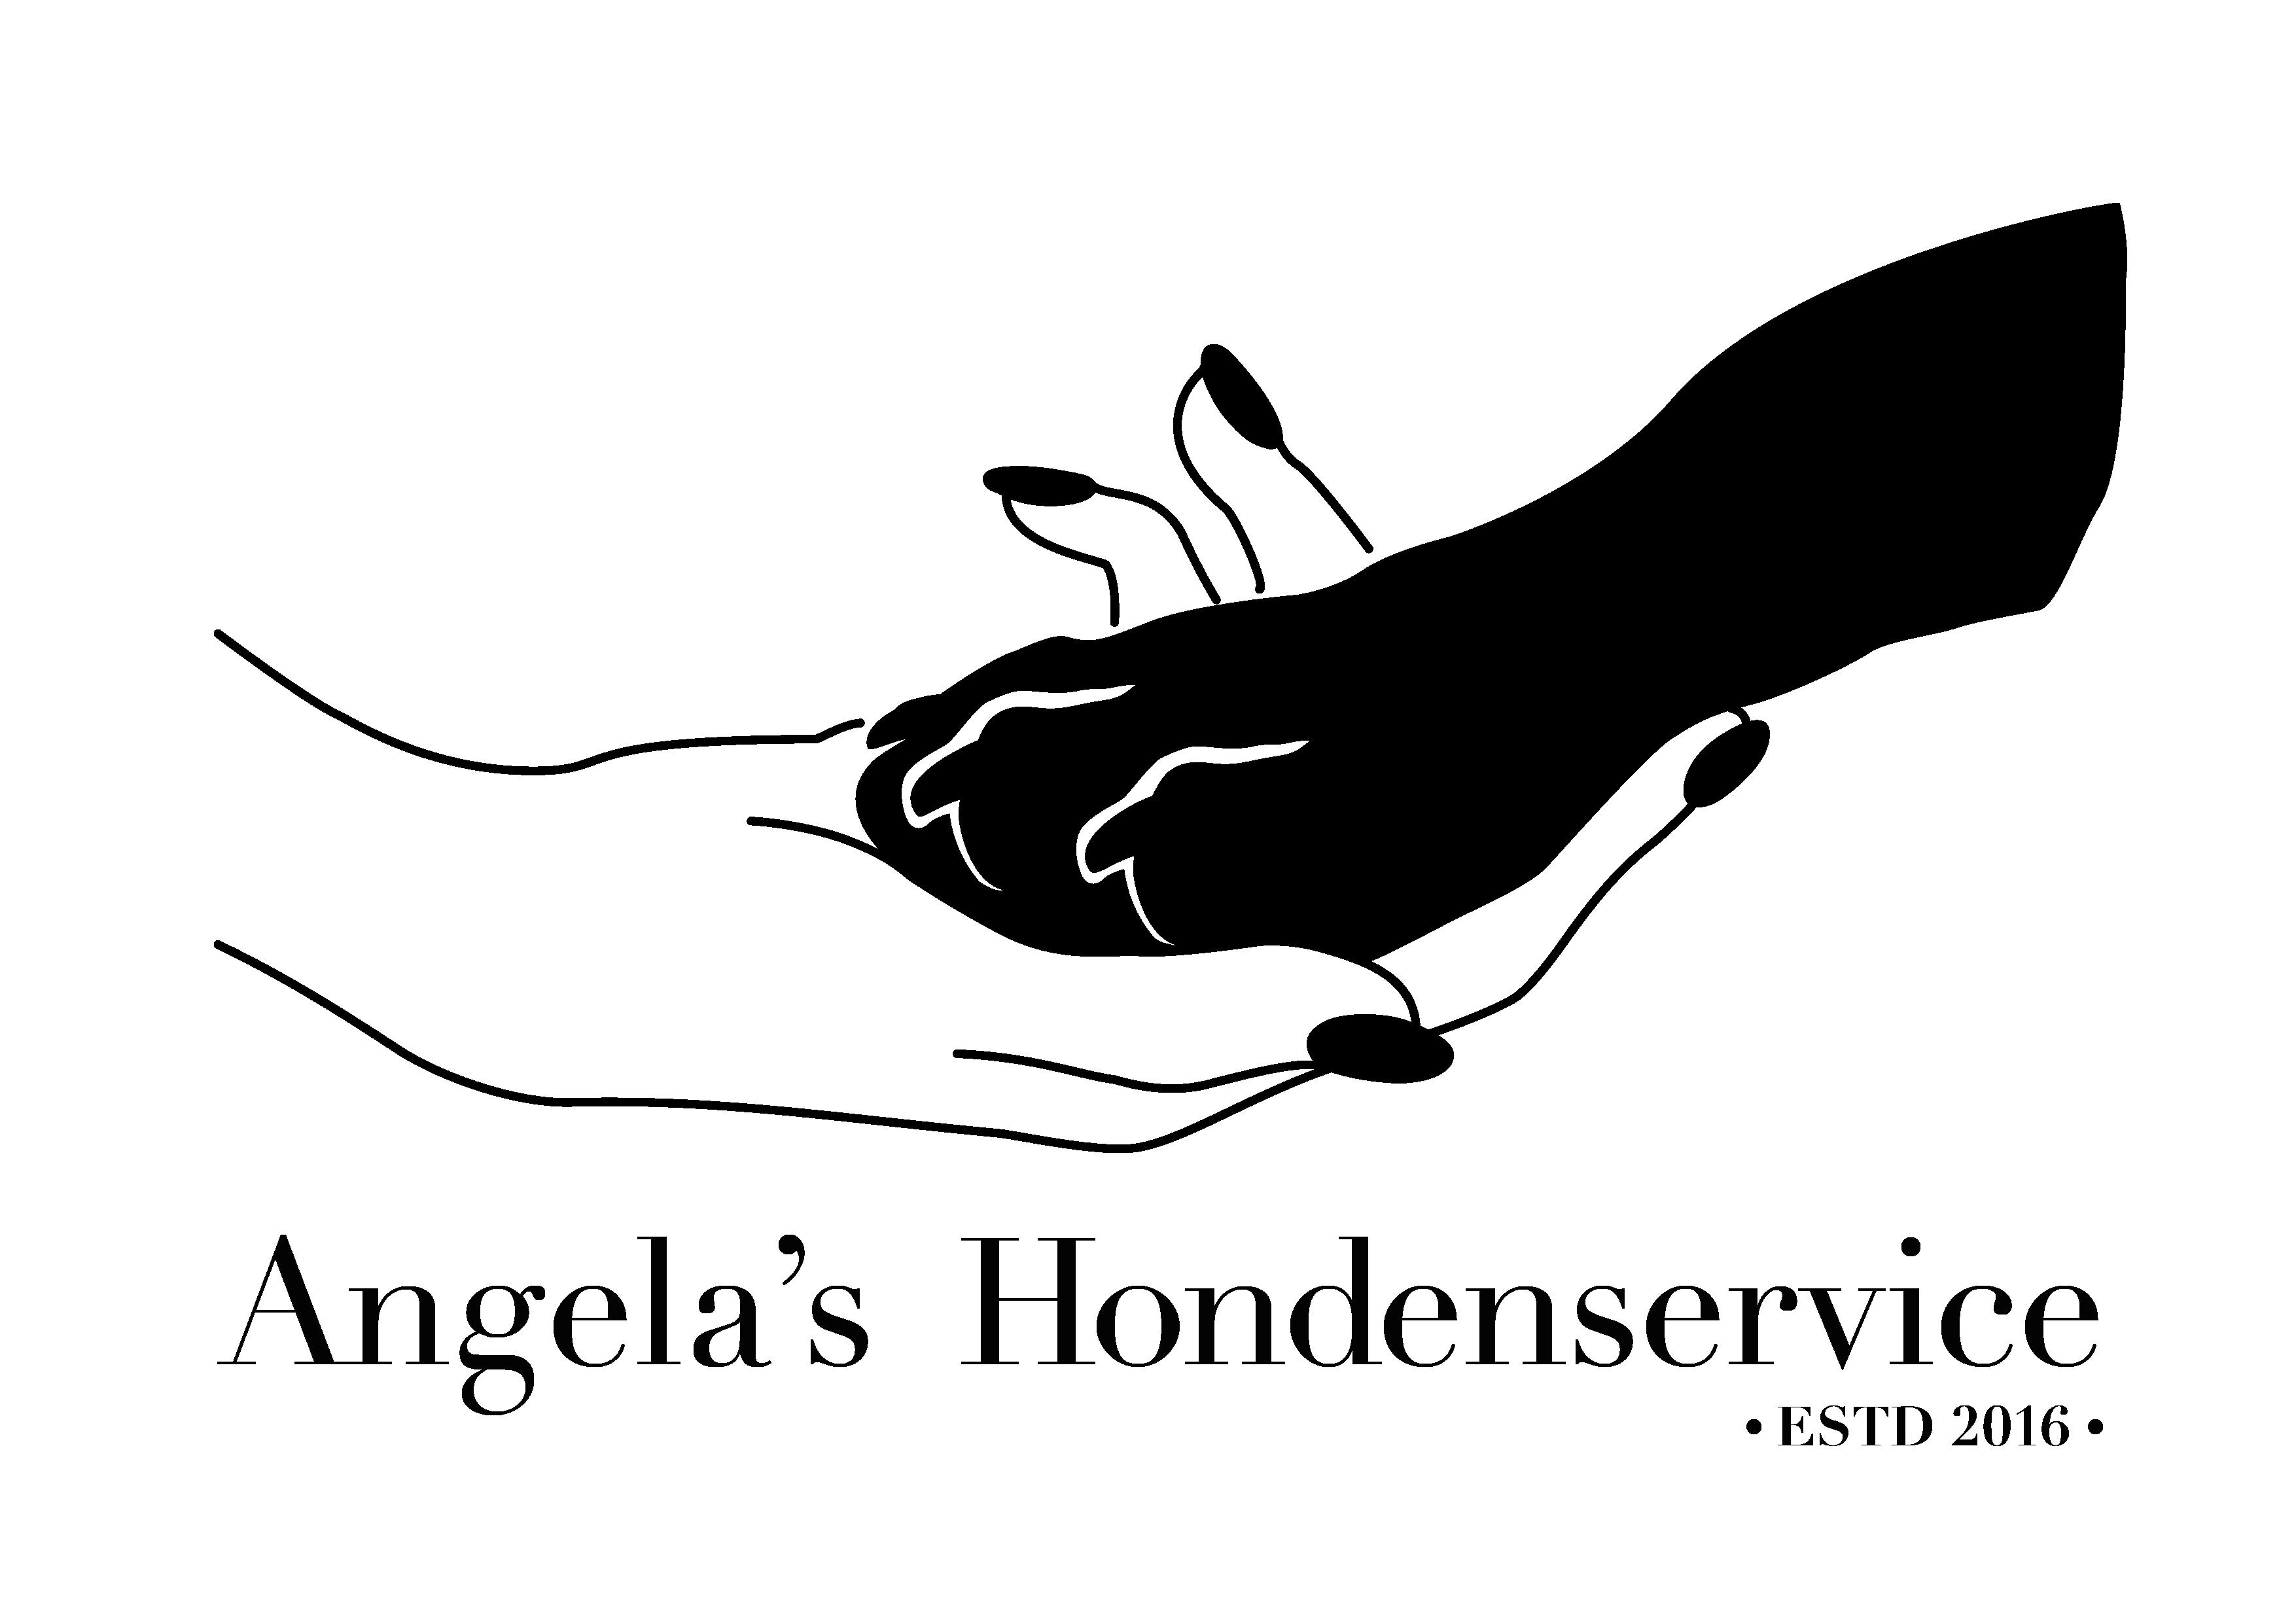 Angela's Hondenservice